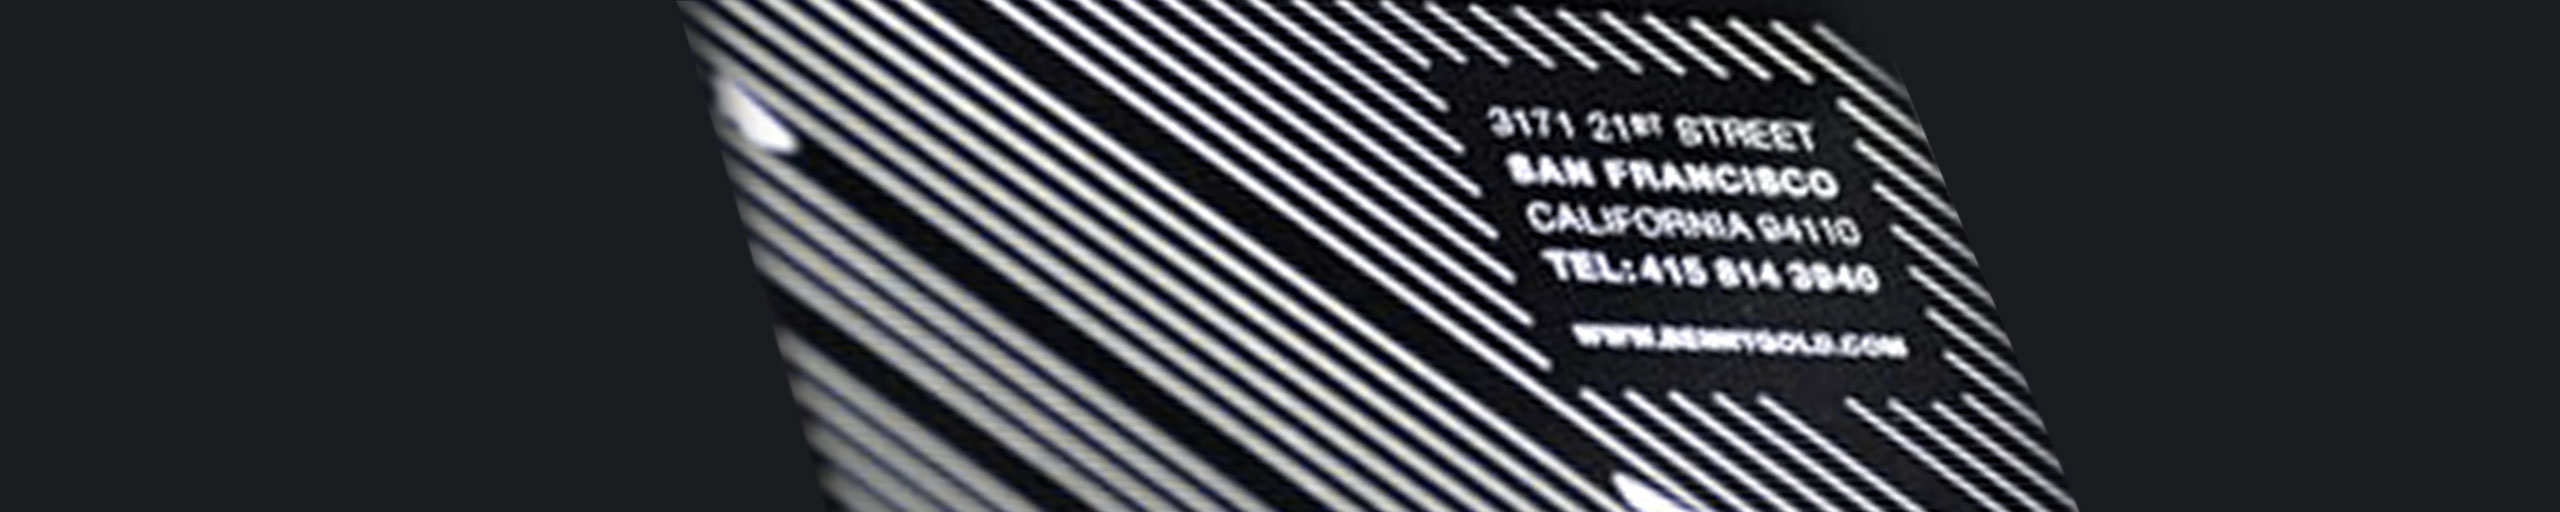 Screen Printed Business Cards — Light on Dark